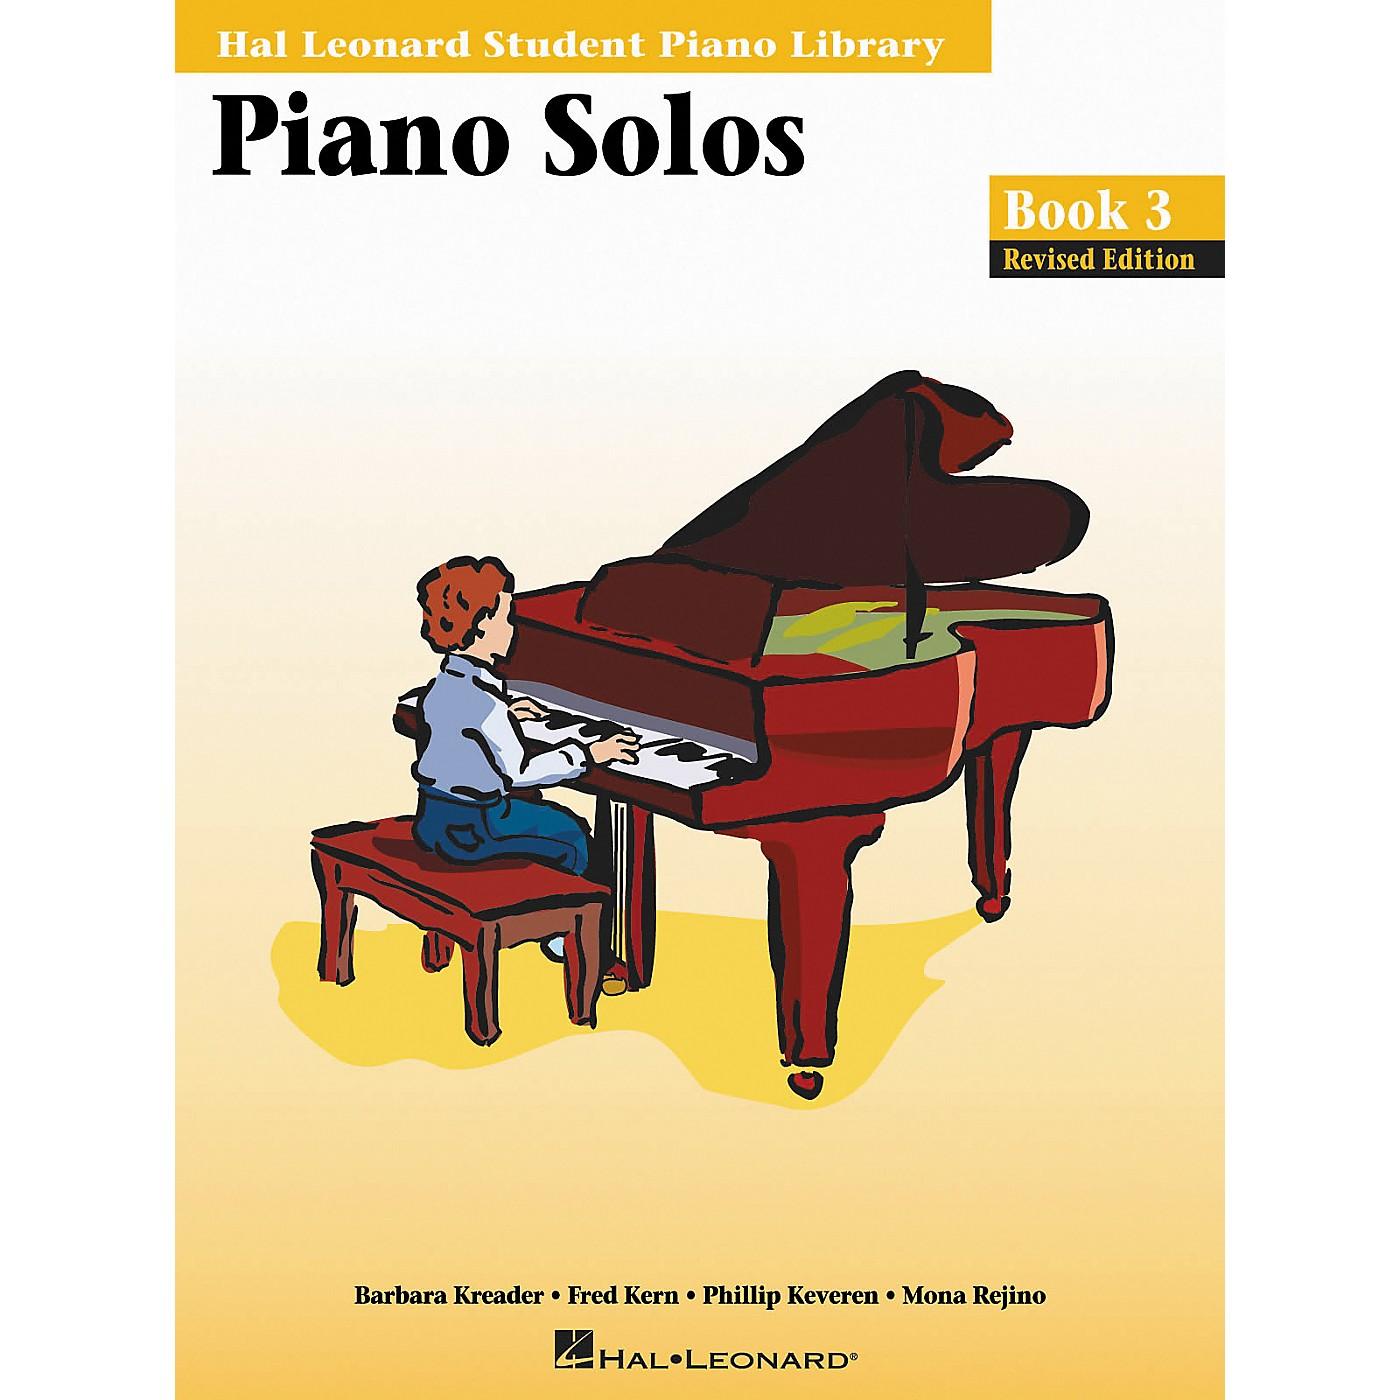 Hal Leonard Piano Solos Book 3 Hal Leonard Student Piano Library thumbnail